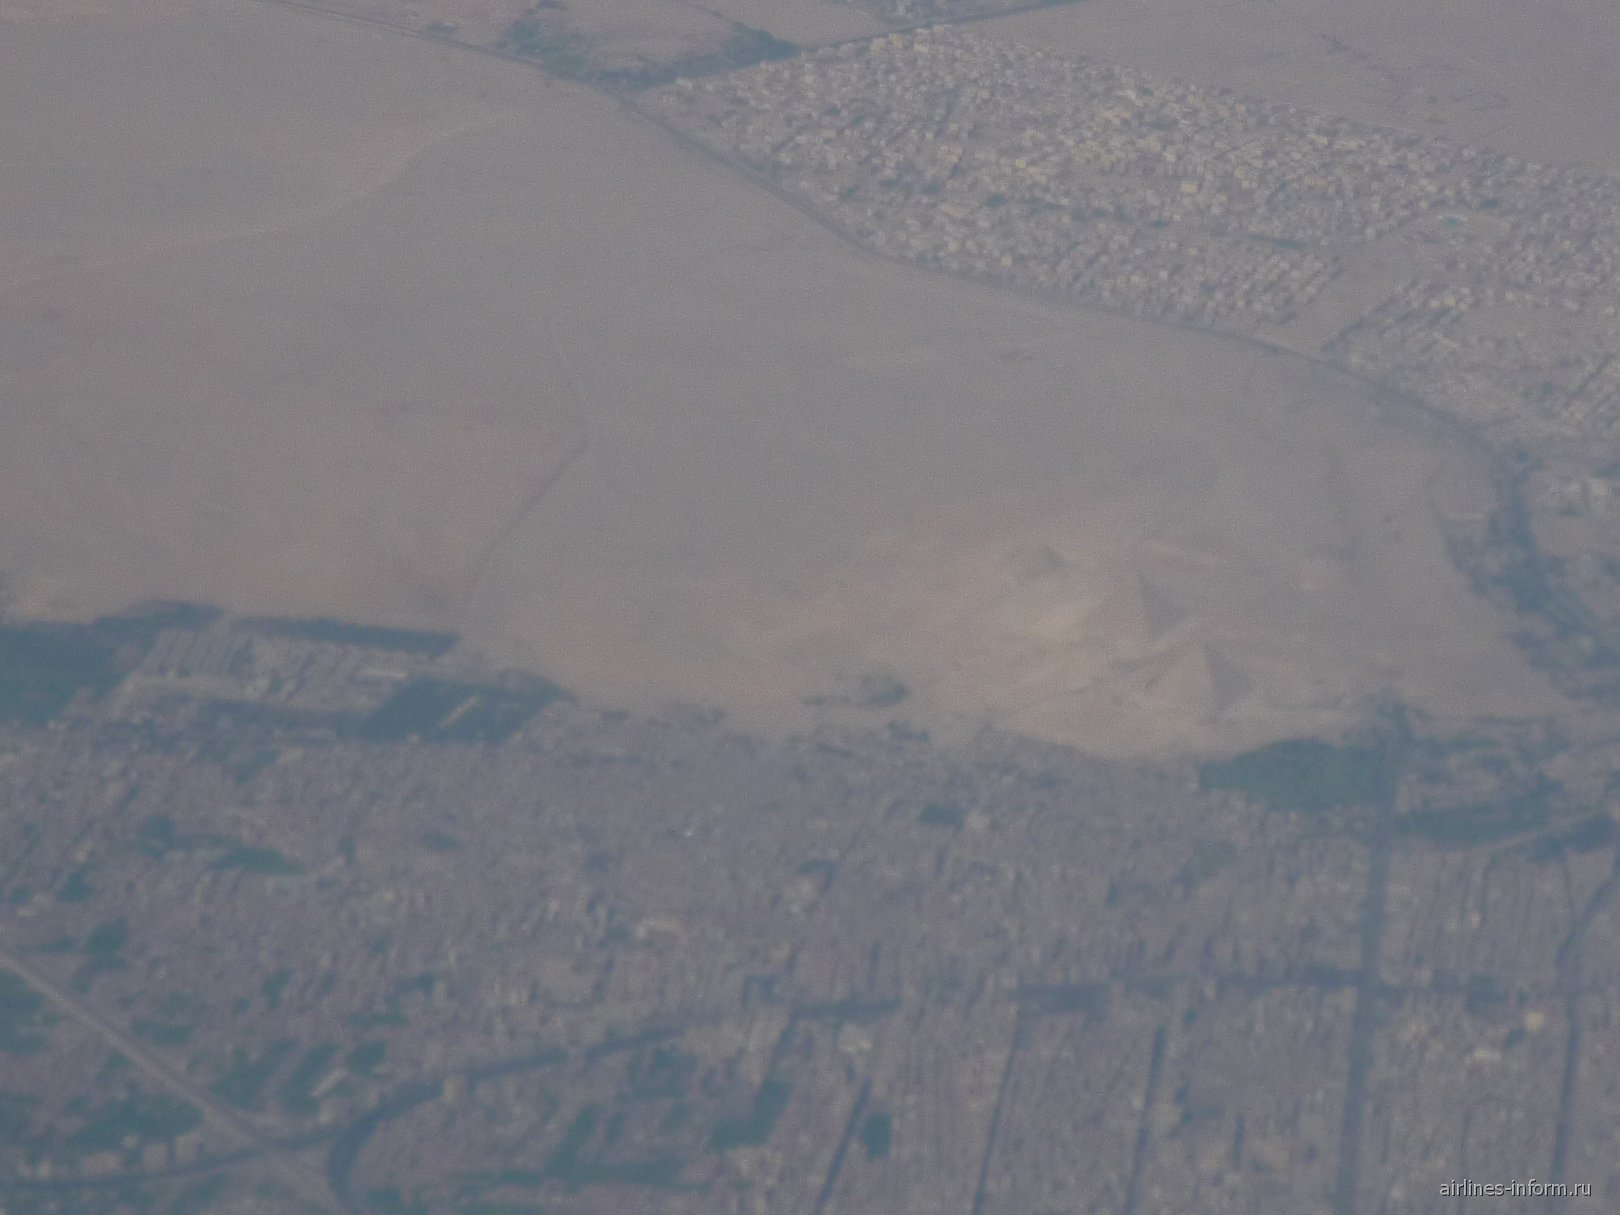 В полете над Египетскими пирамидами